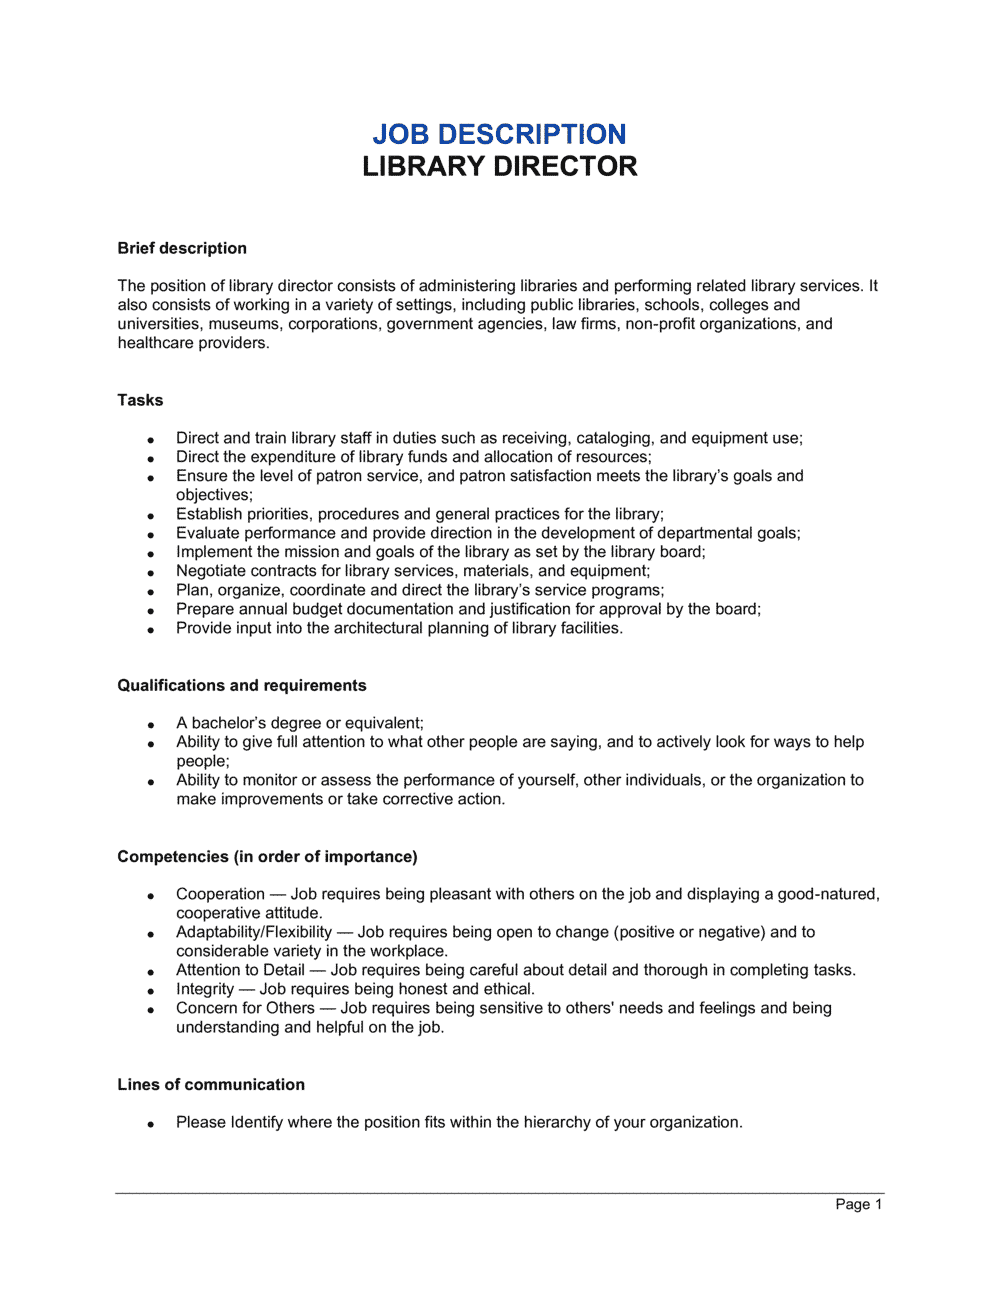 library-director-job-responsibilities-2